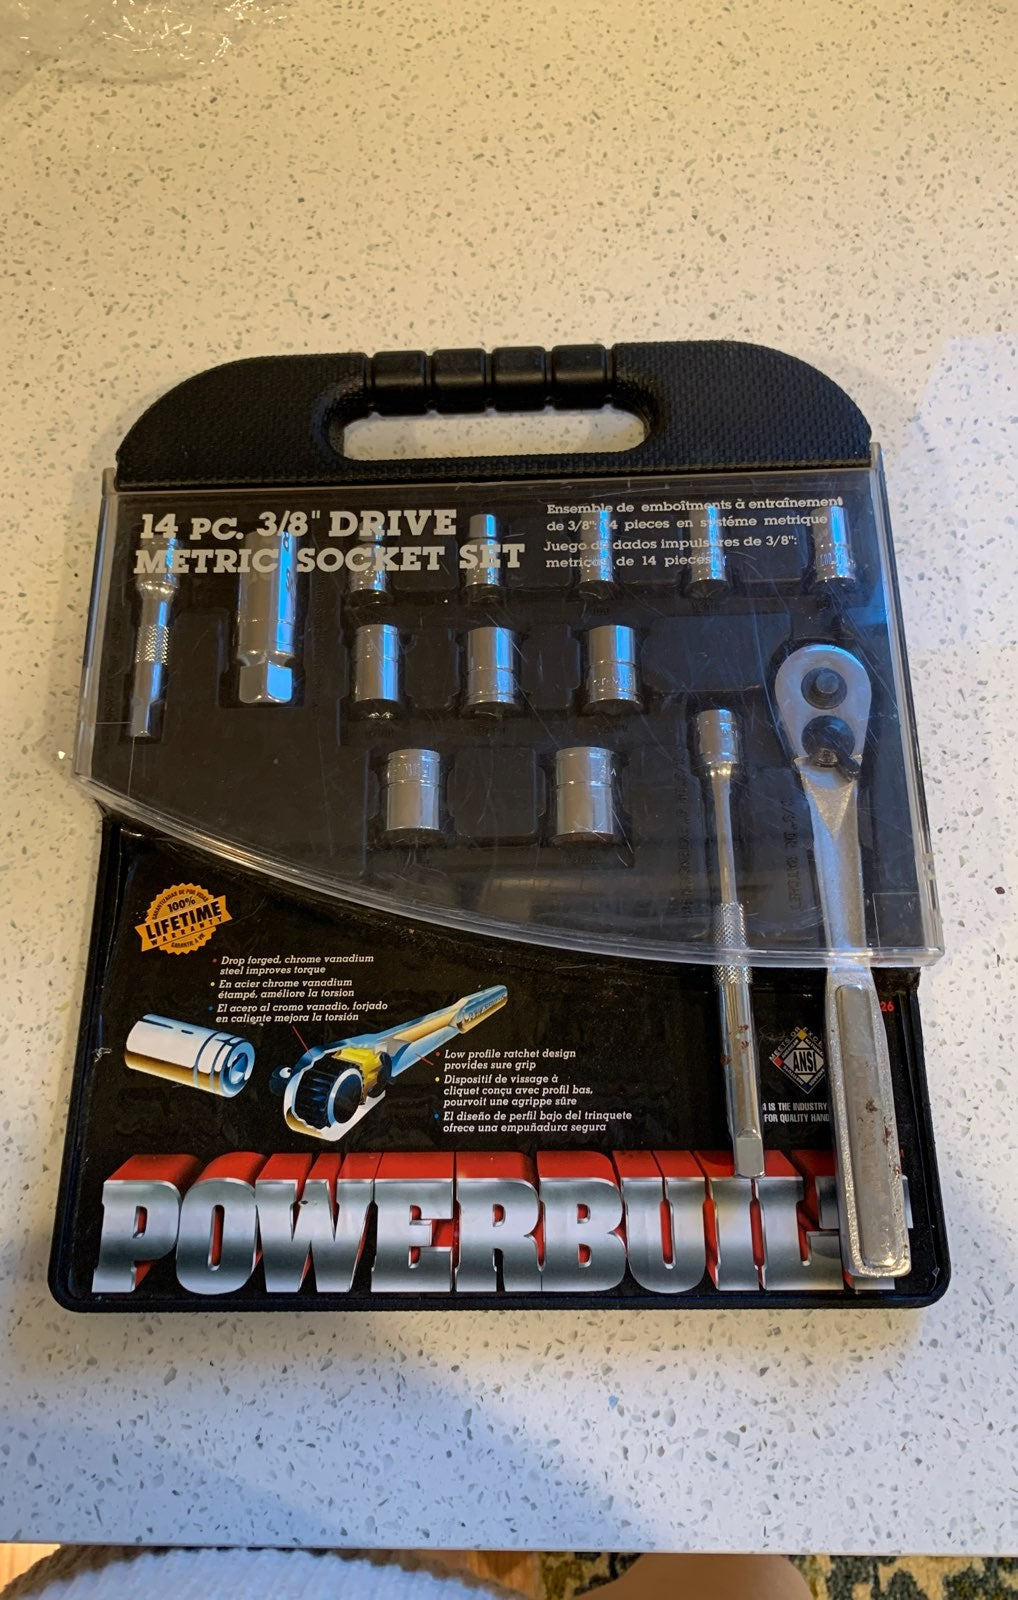 Powerbuilt metric sicket set